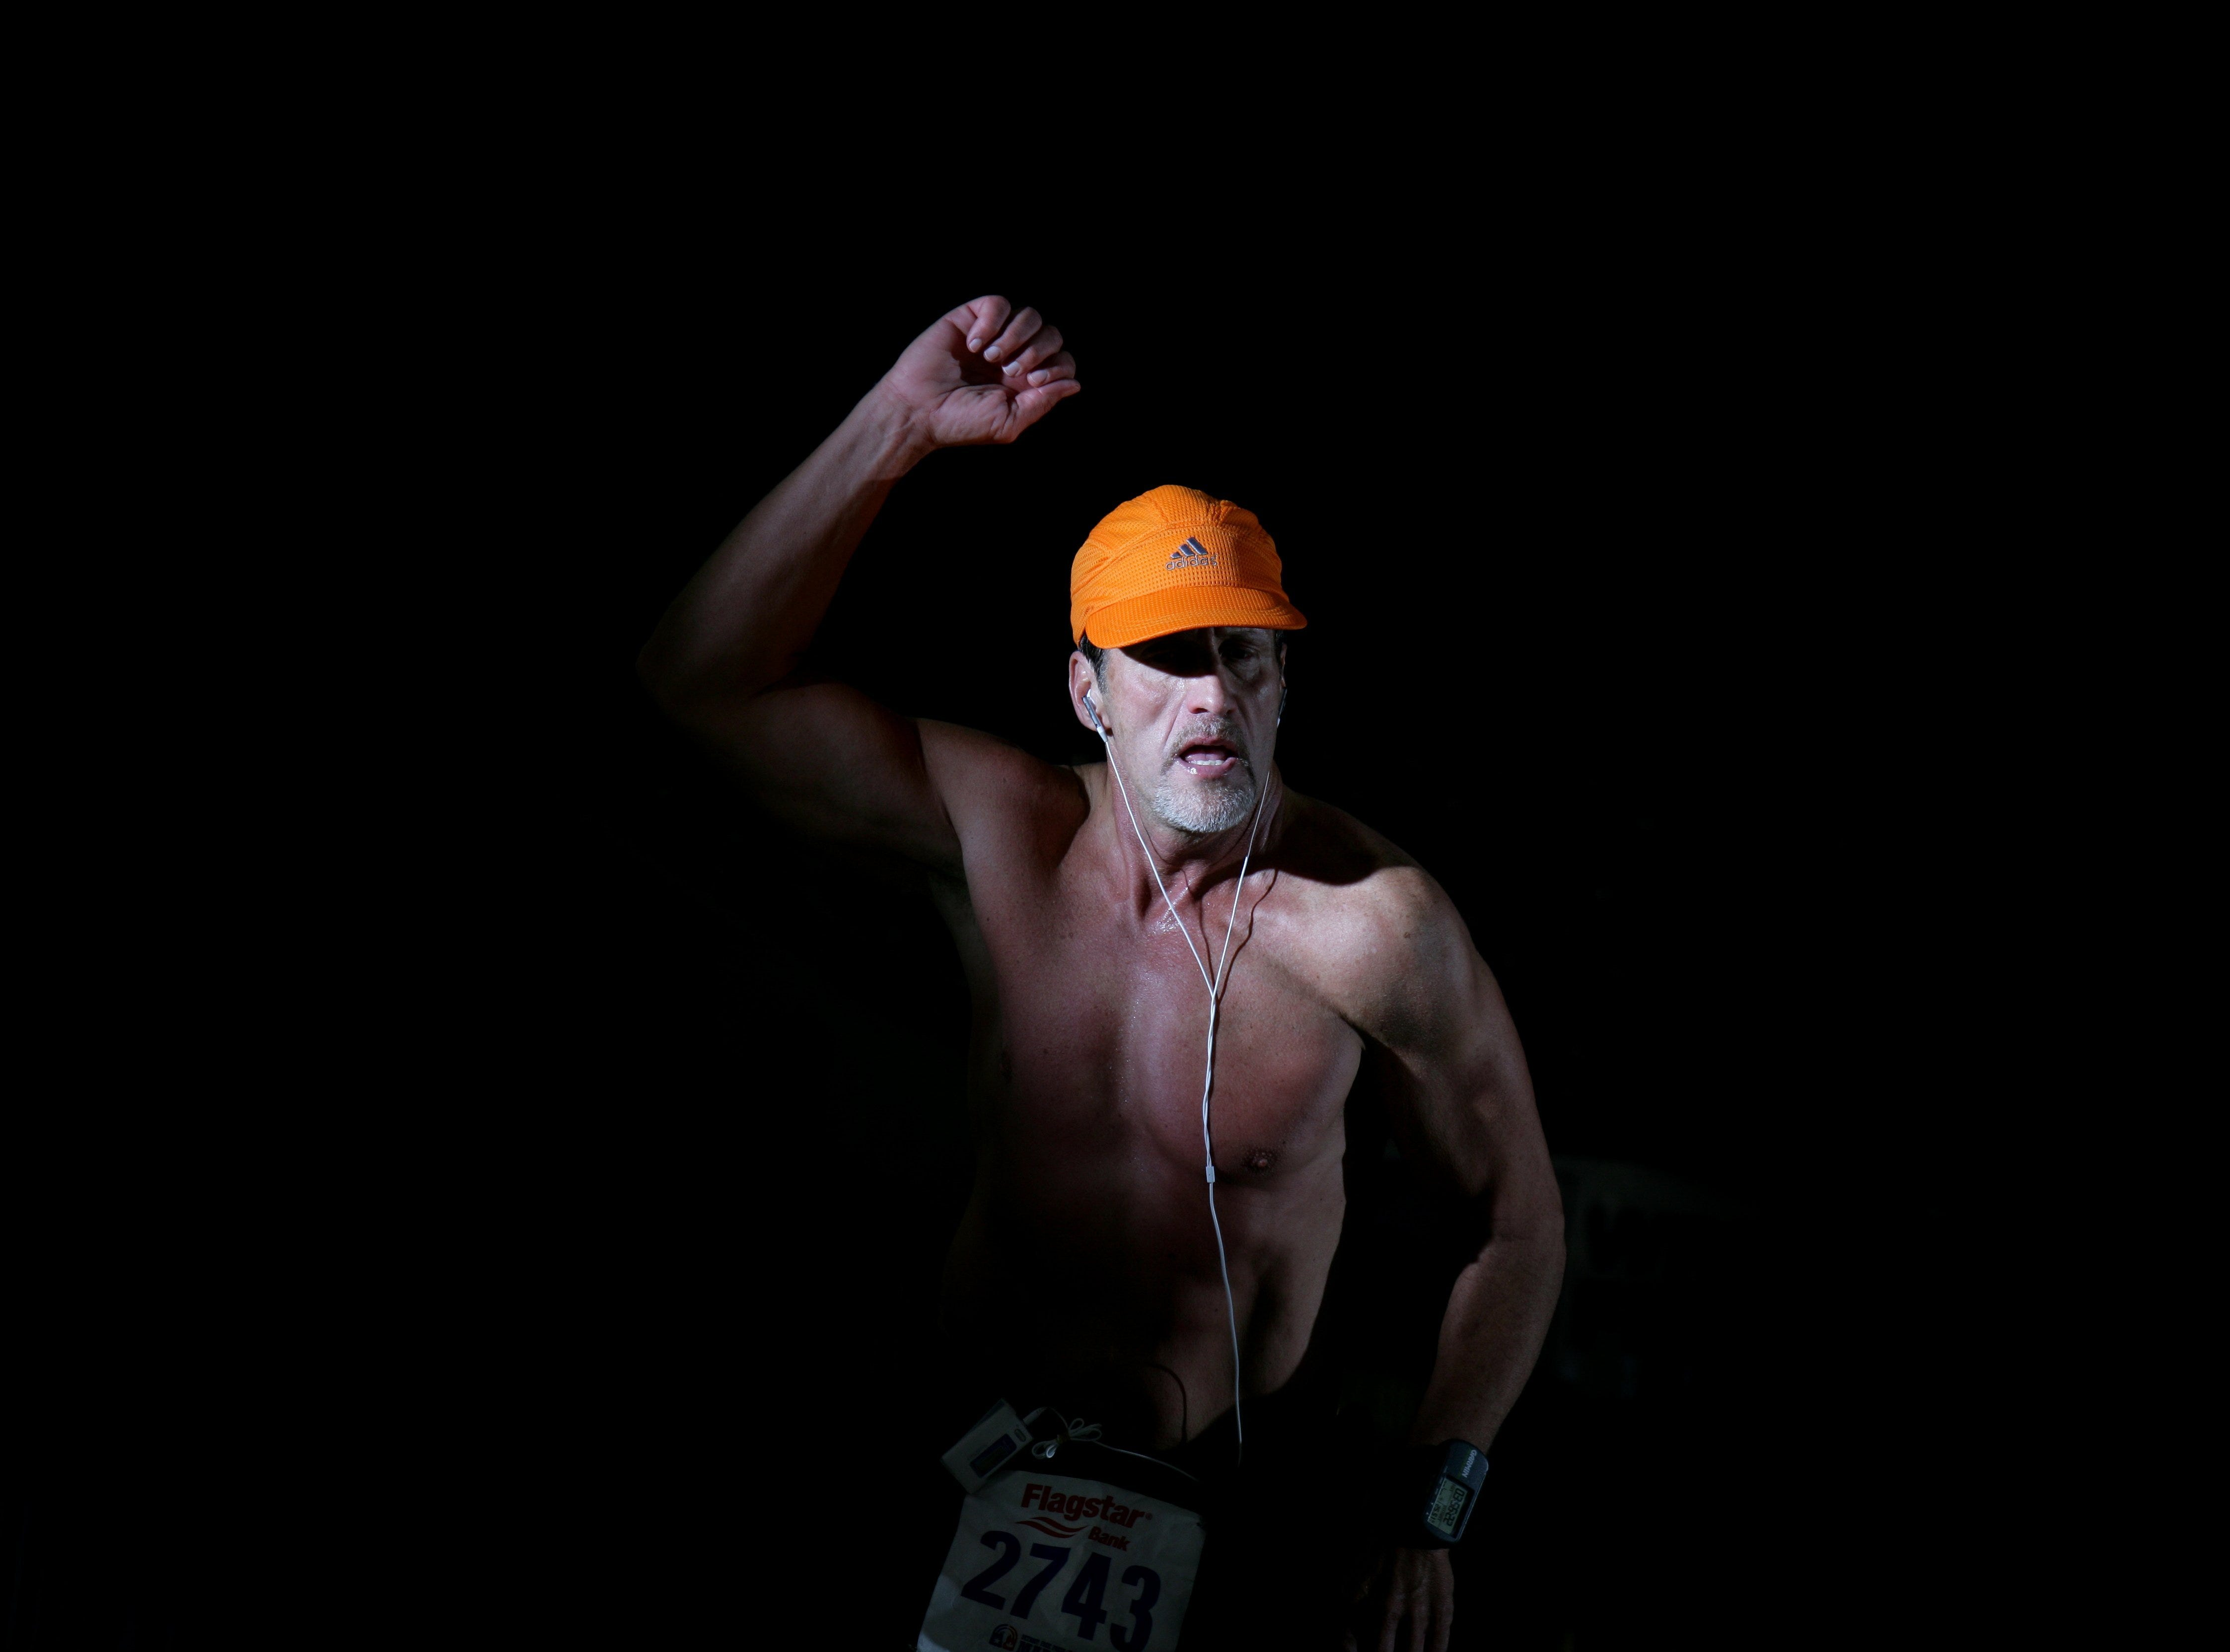 Eric Bischof, 49, of North Royalton, Ohio during the Free Press marathon on Sunday, October 23, 2005.